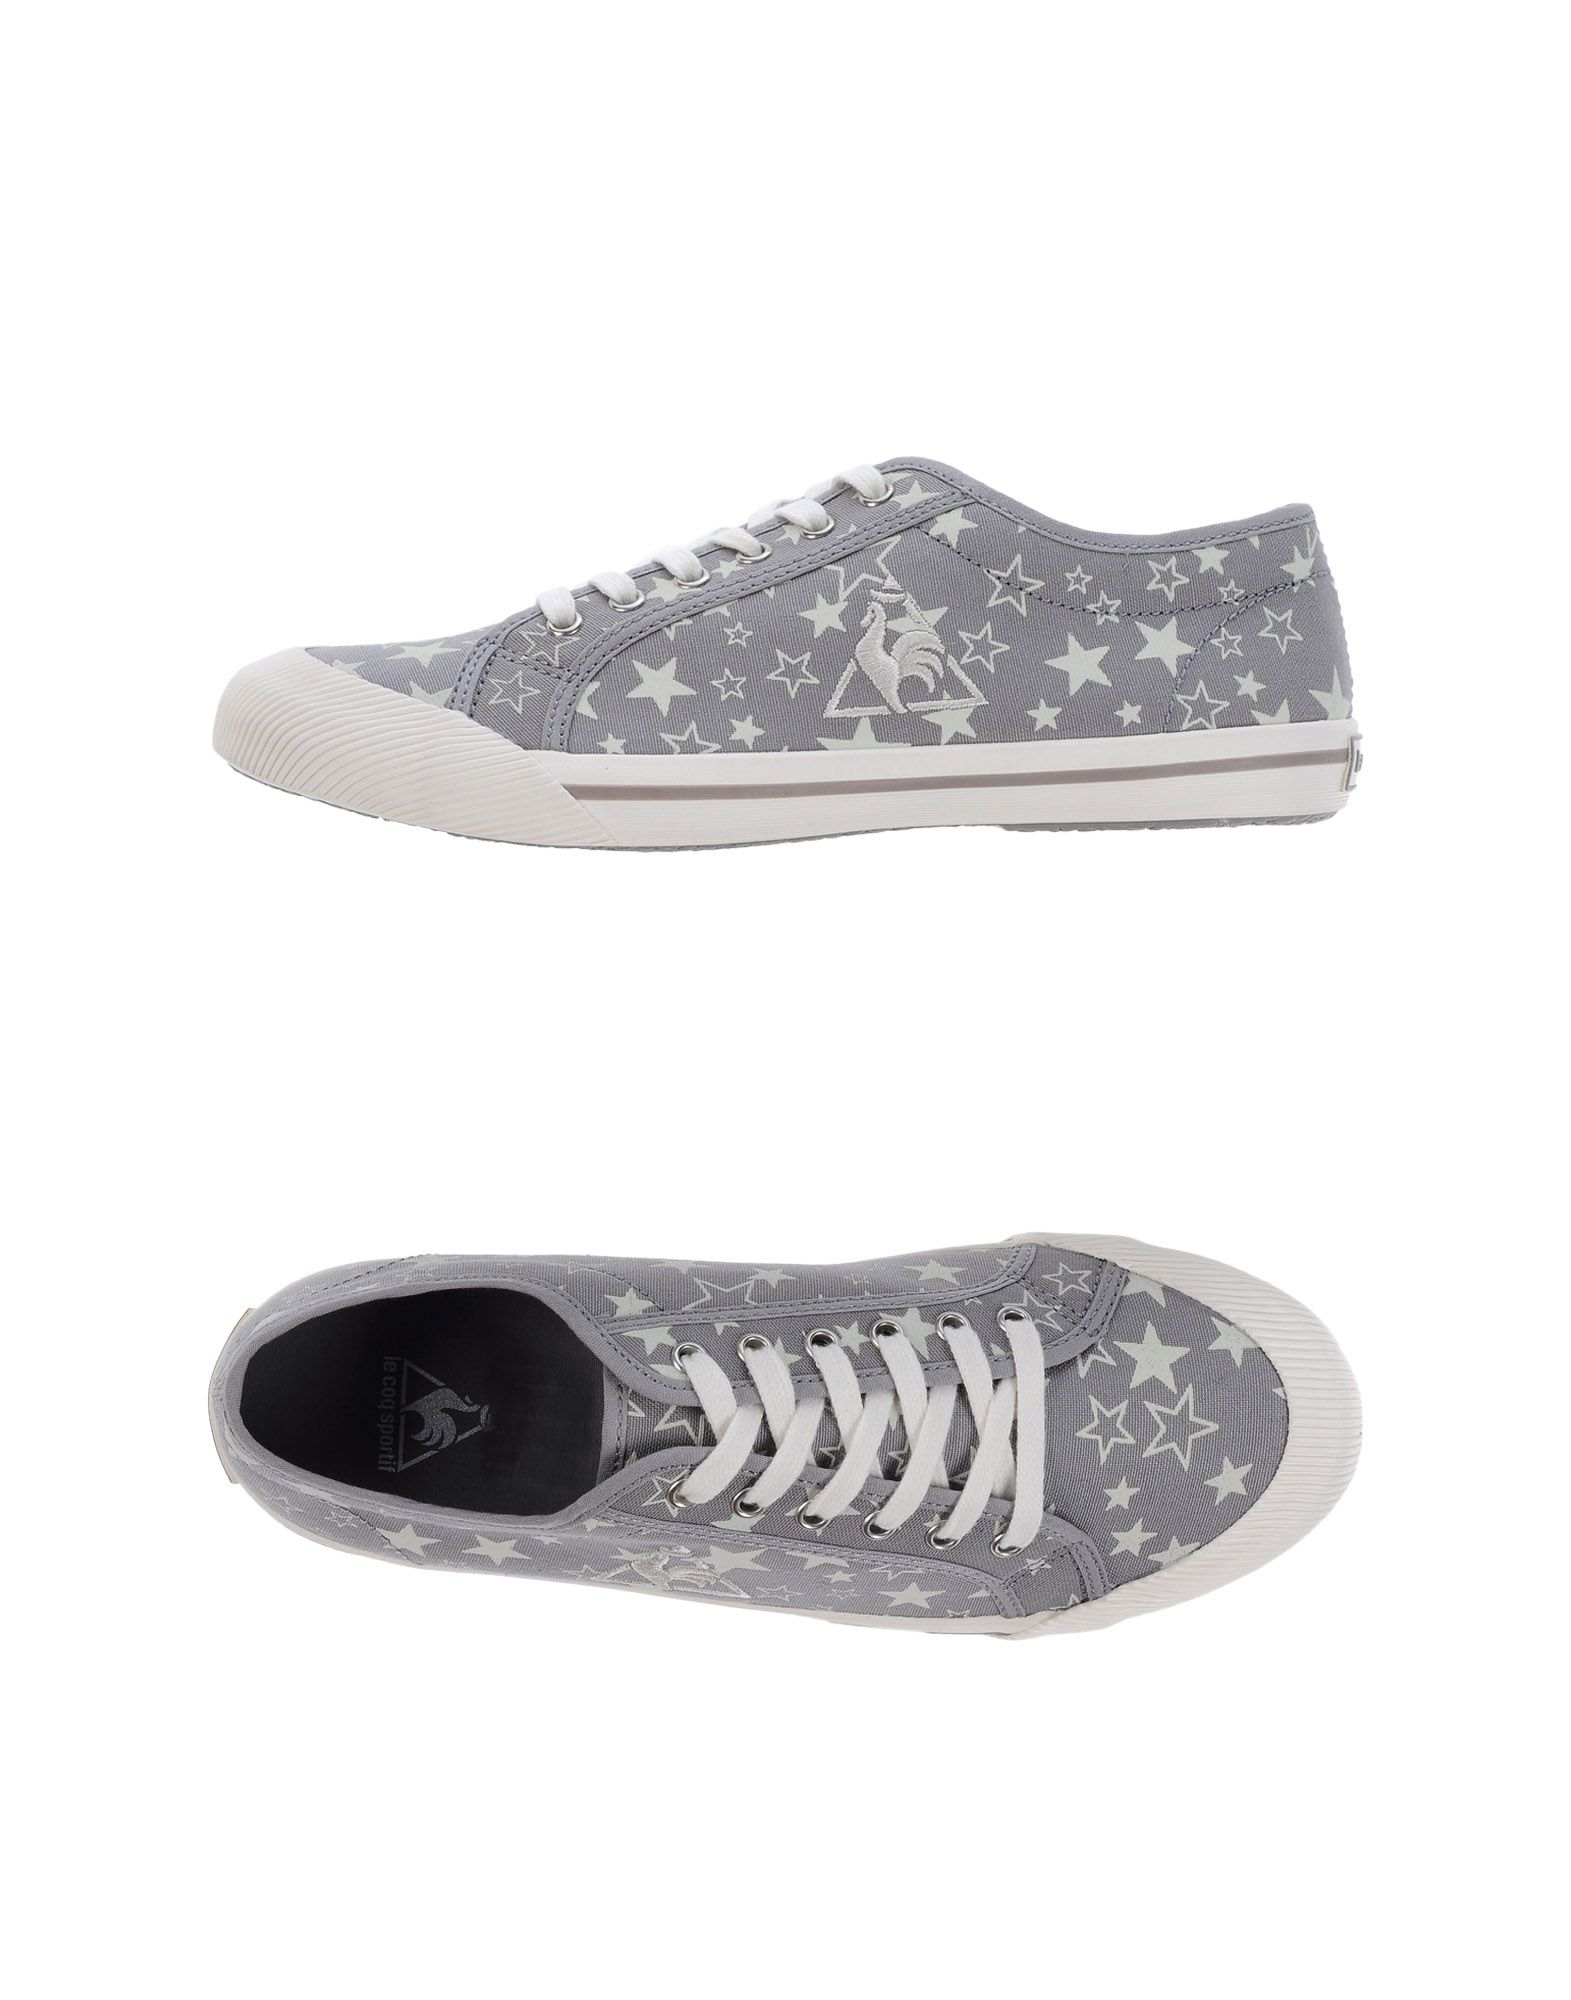 Le Coq Sportif Sneakers Qualität Damen  44858037OK Gute Qualität Sneakers beliebte Schuhe 84541c